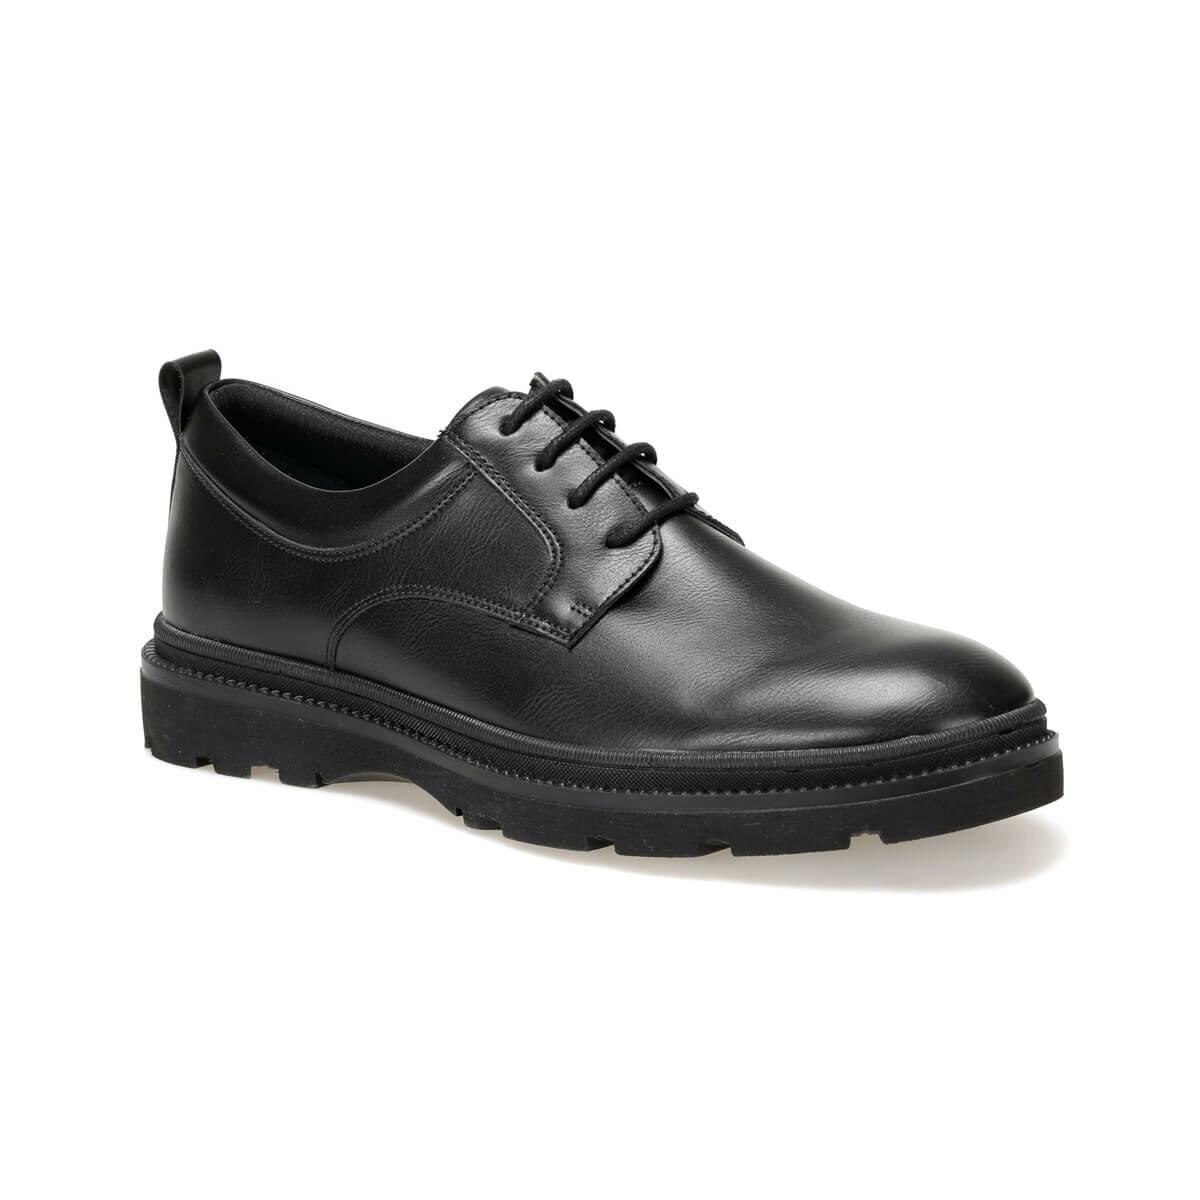 Flo MR2-1 Zwarte Mannen Klassieke Schoenen Jj-Stiller